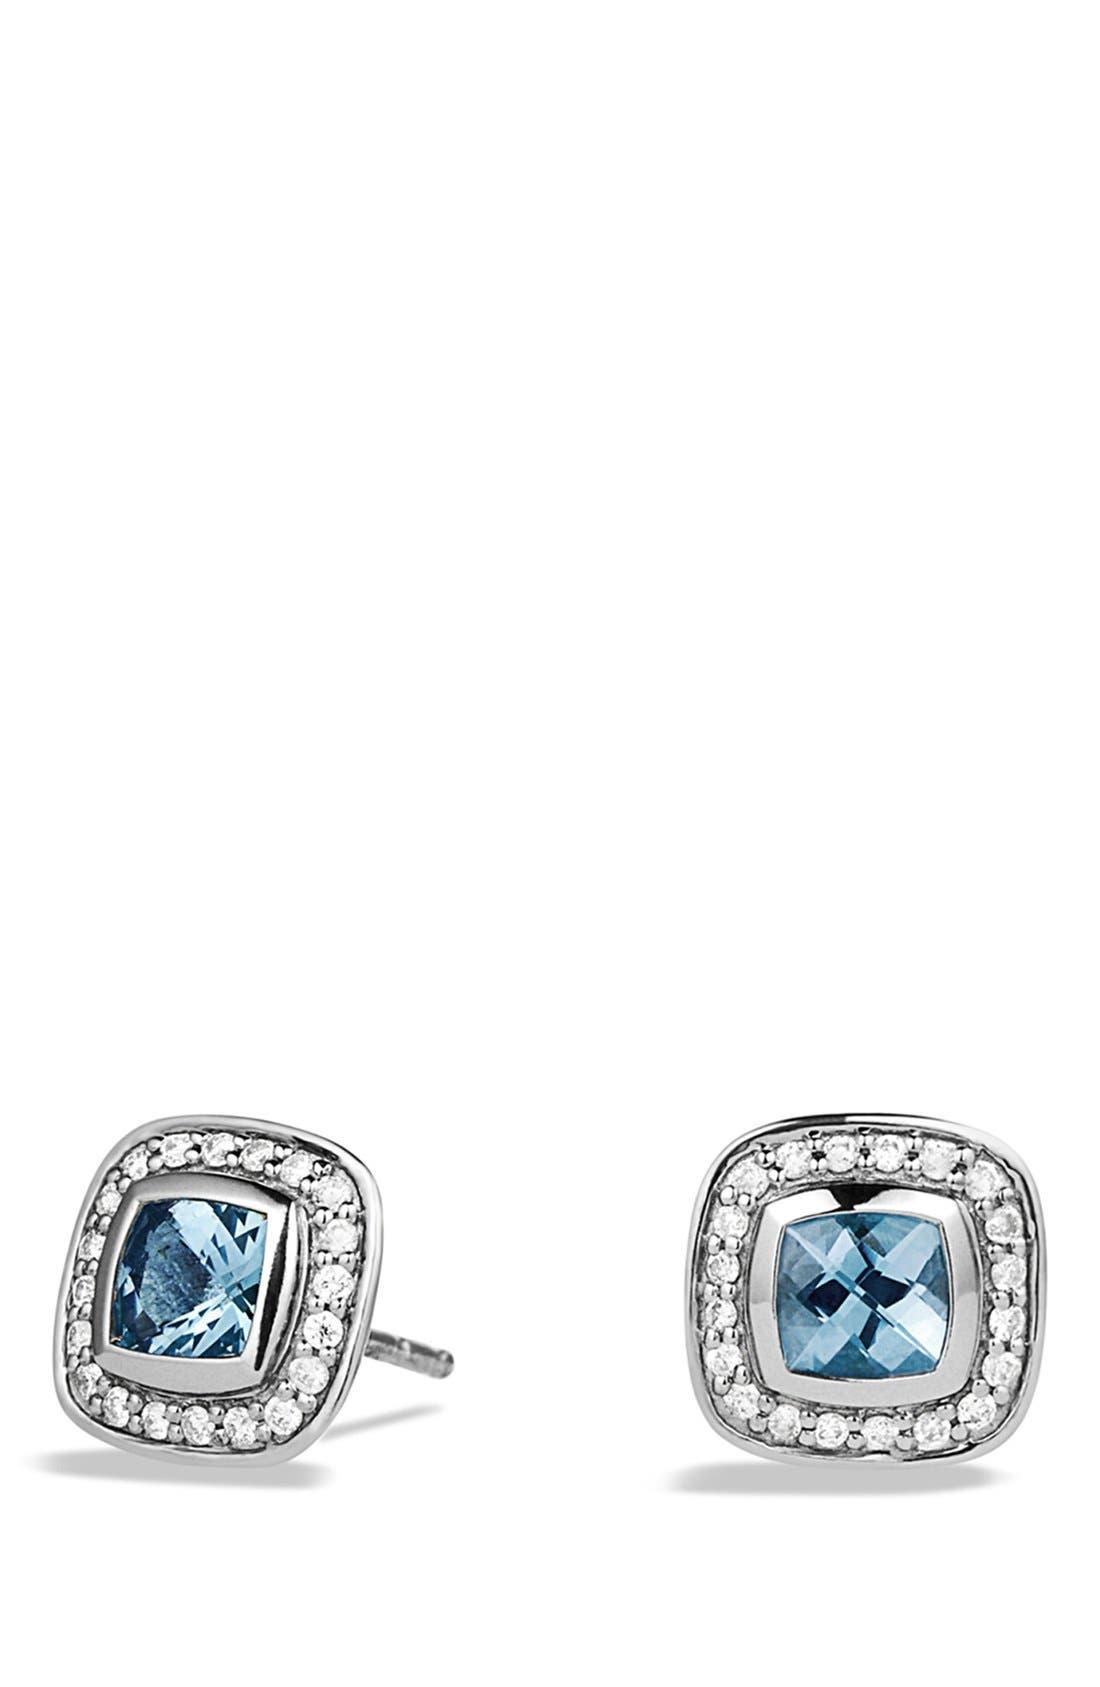 Alternate Image 1 Selected - David Yurman 'Albion' Petite Earrings with Diamonds